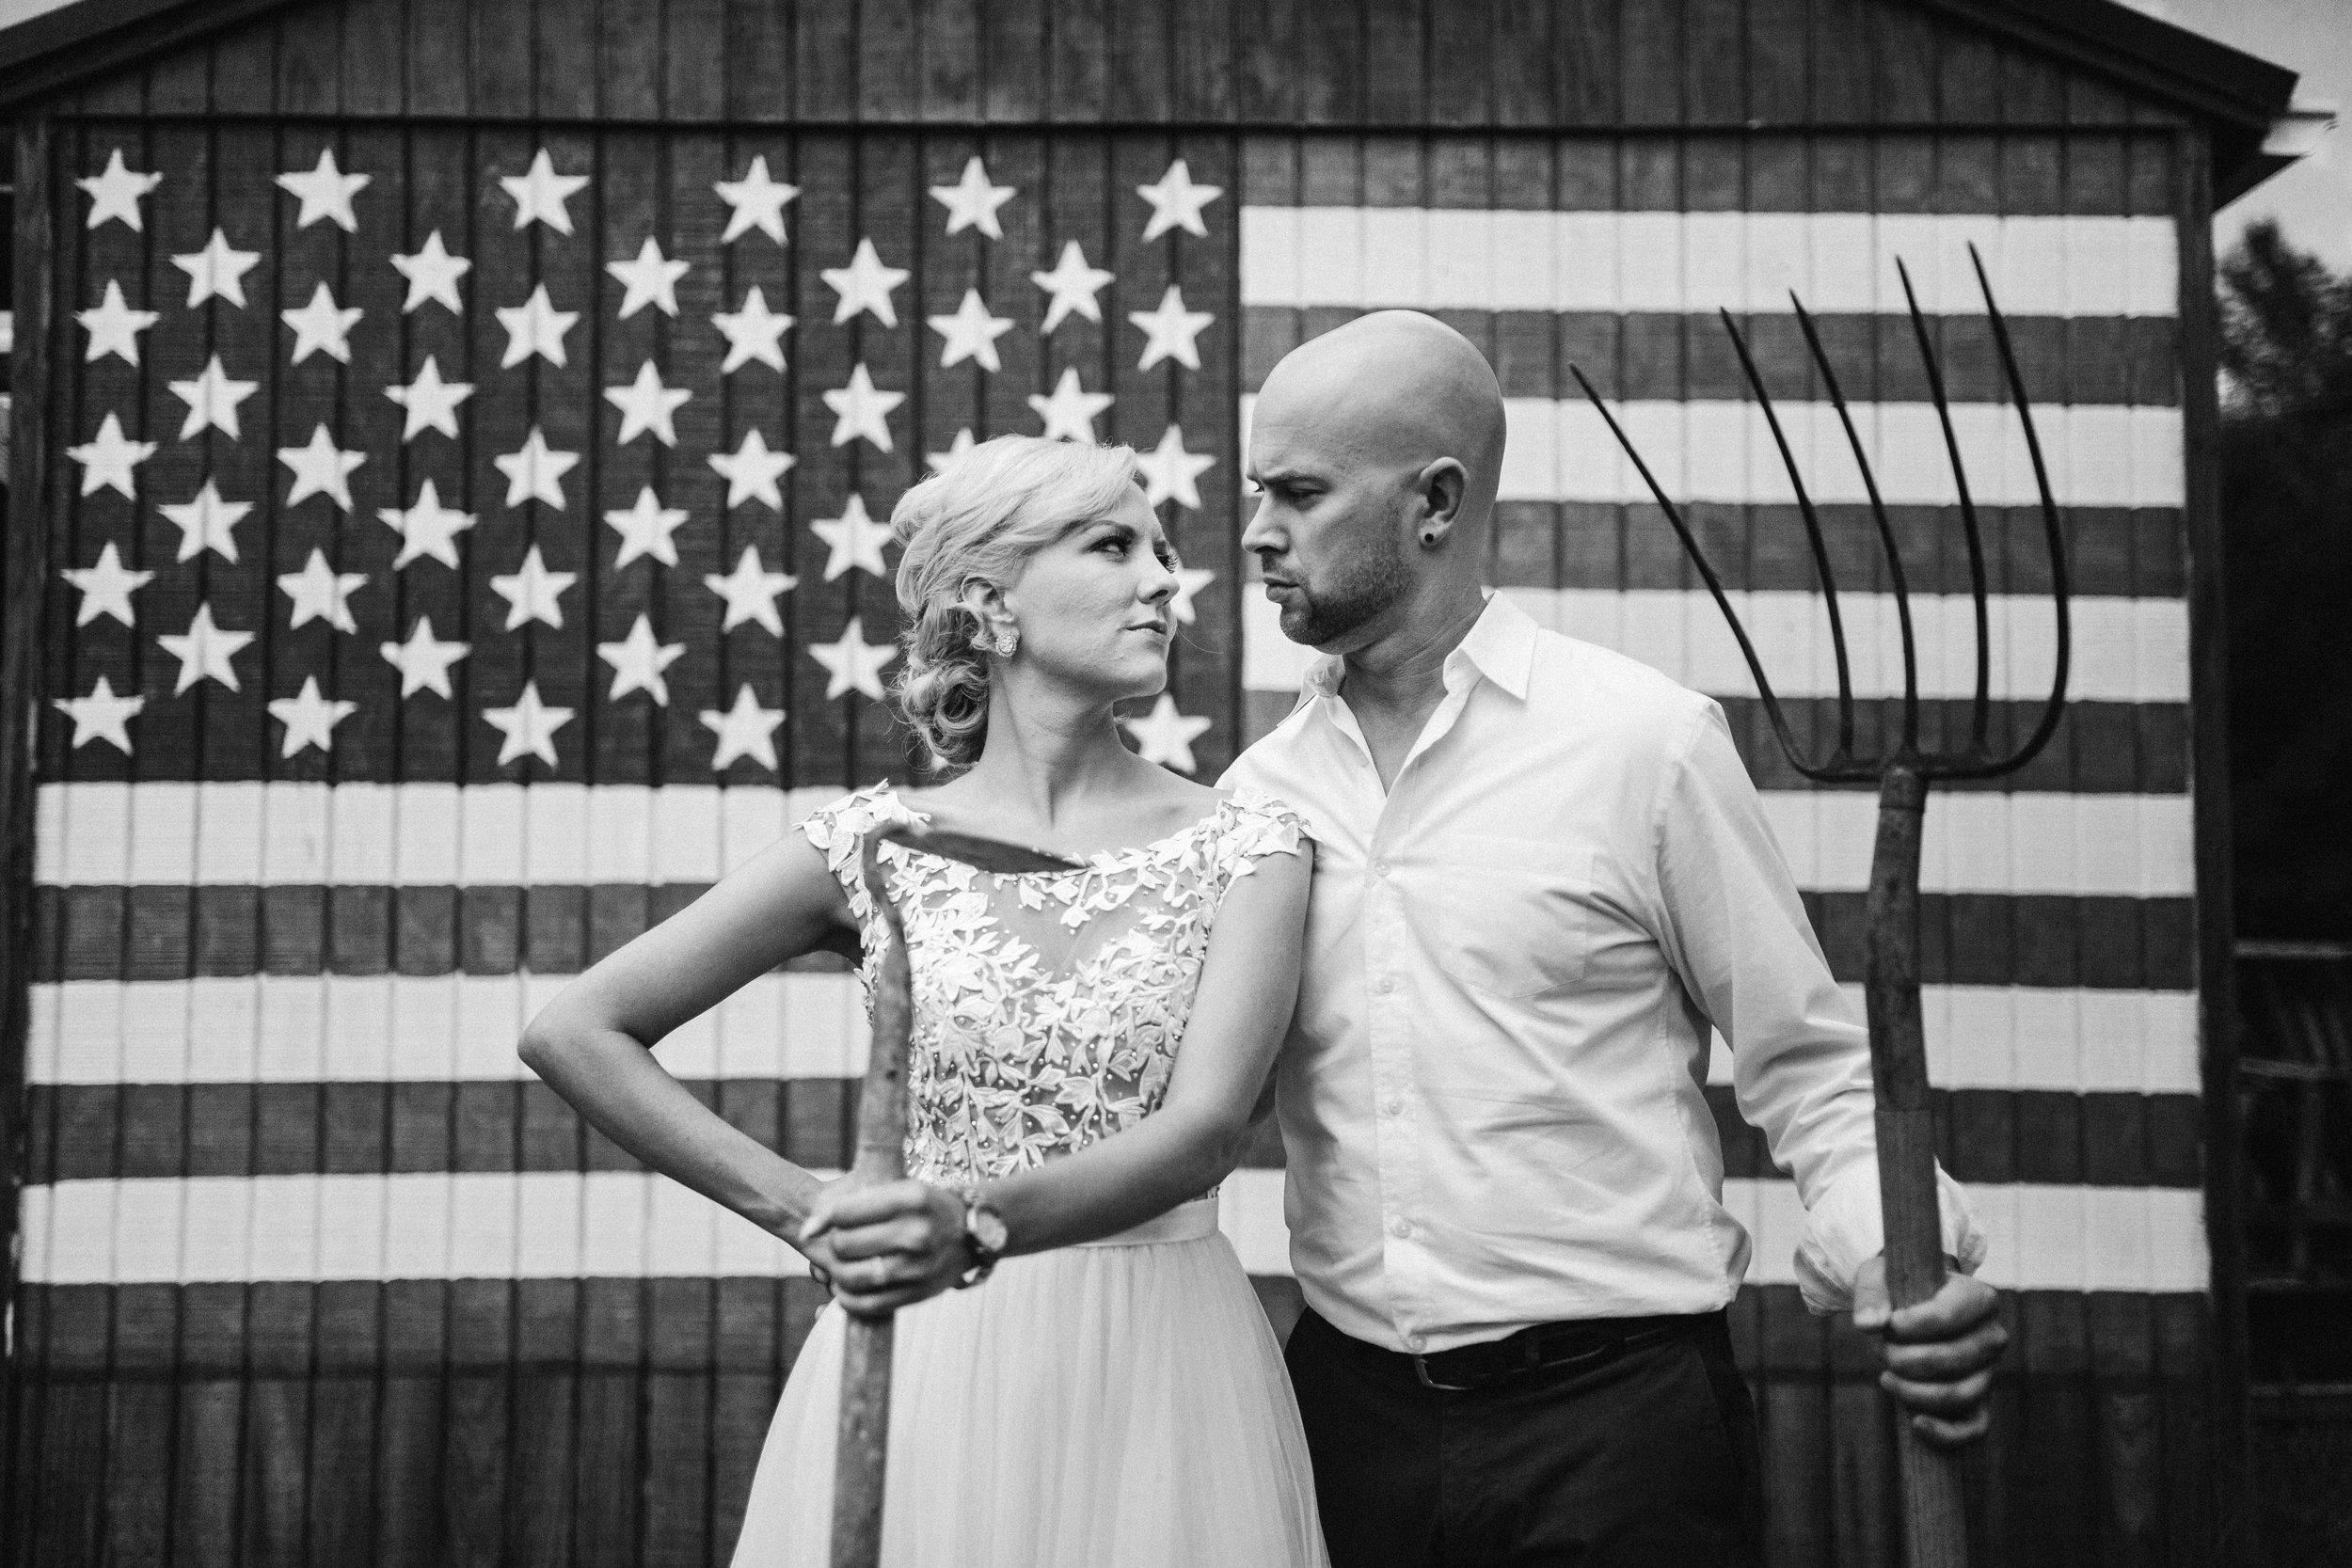 2018.09.02 Ray and Sarah Prizner Nashville TN Wedding FINALS-187.jpg